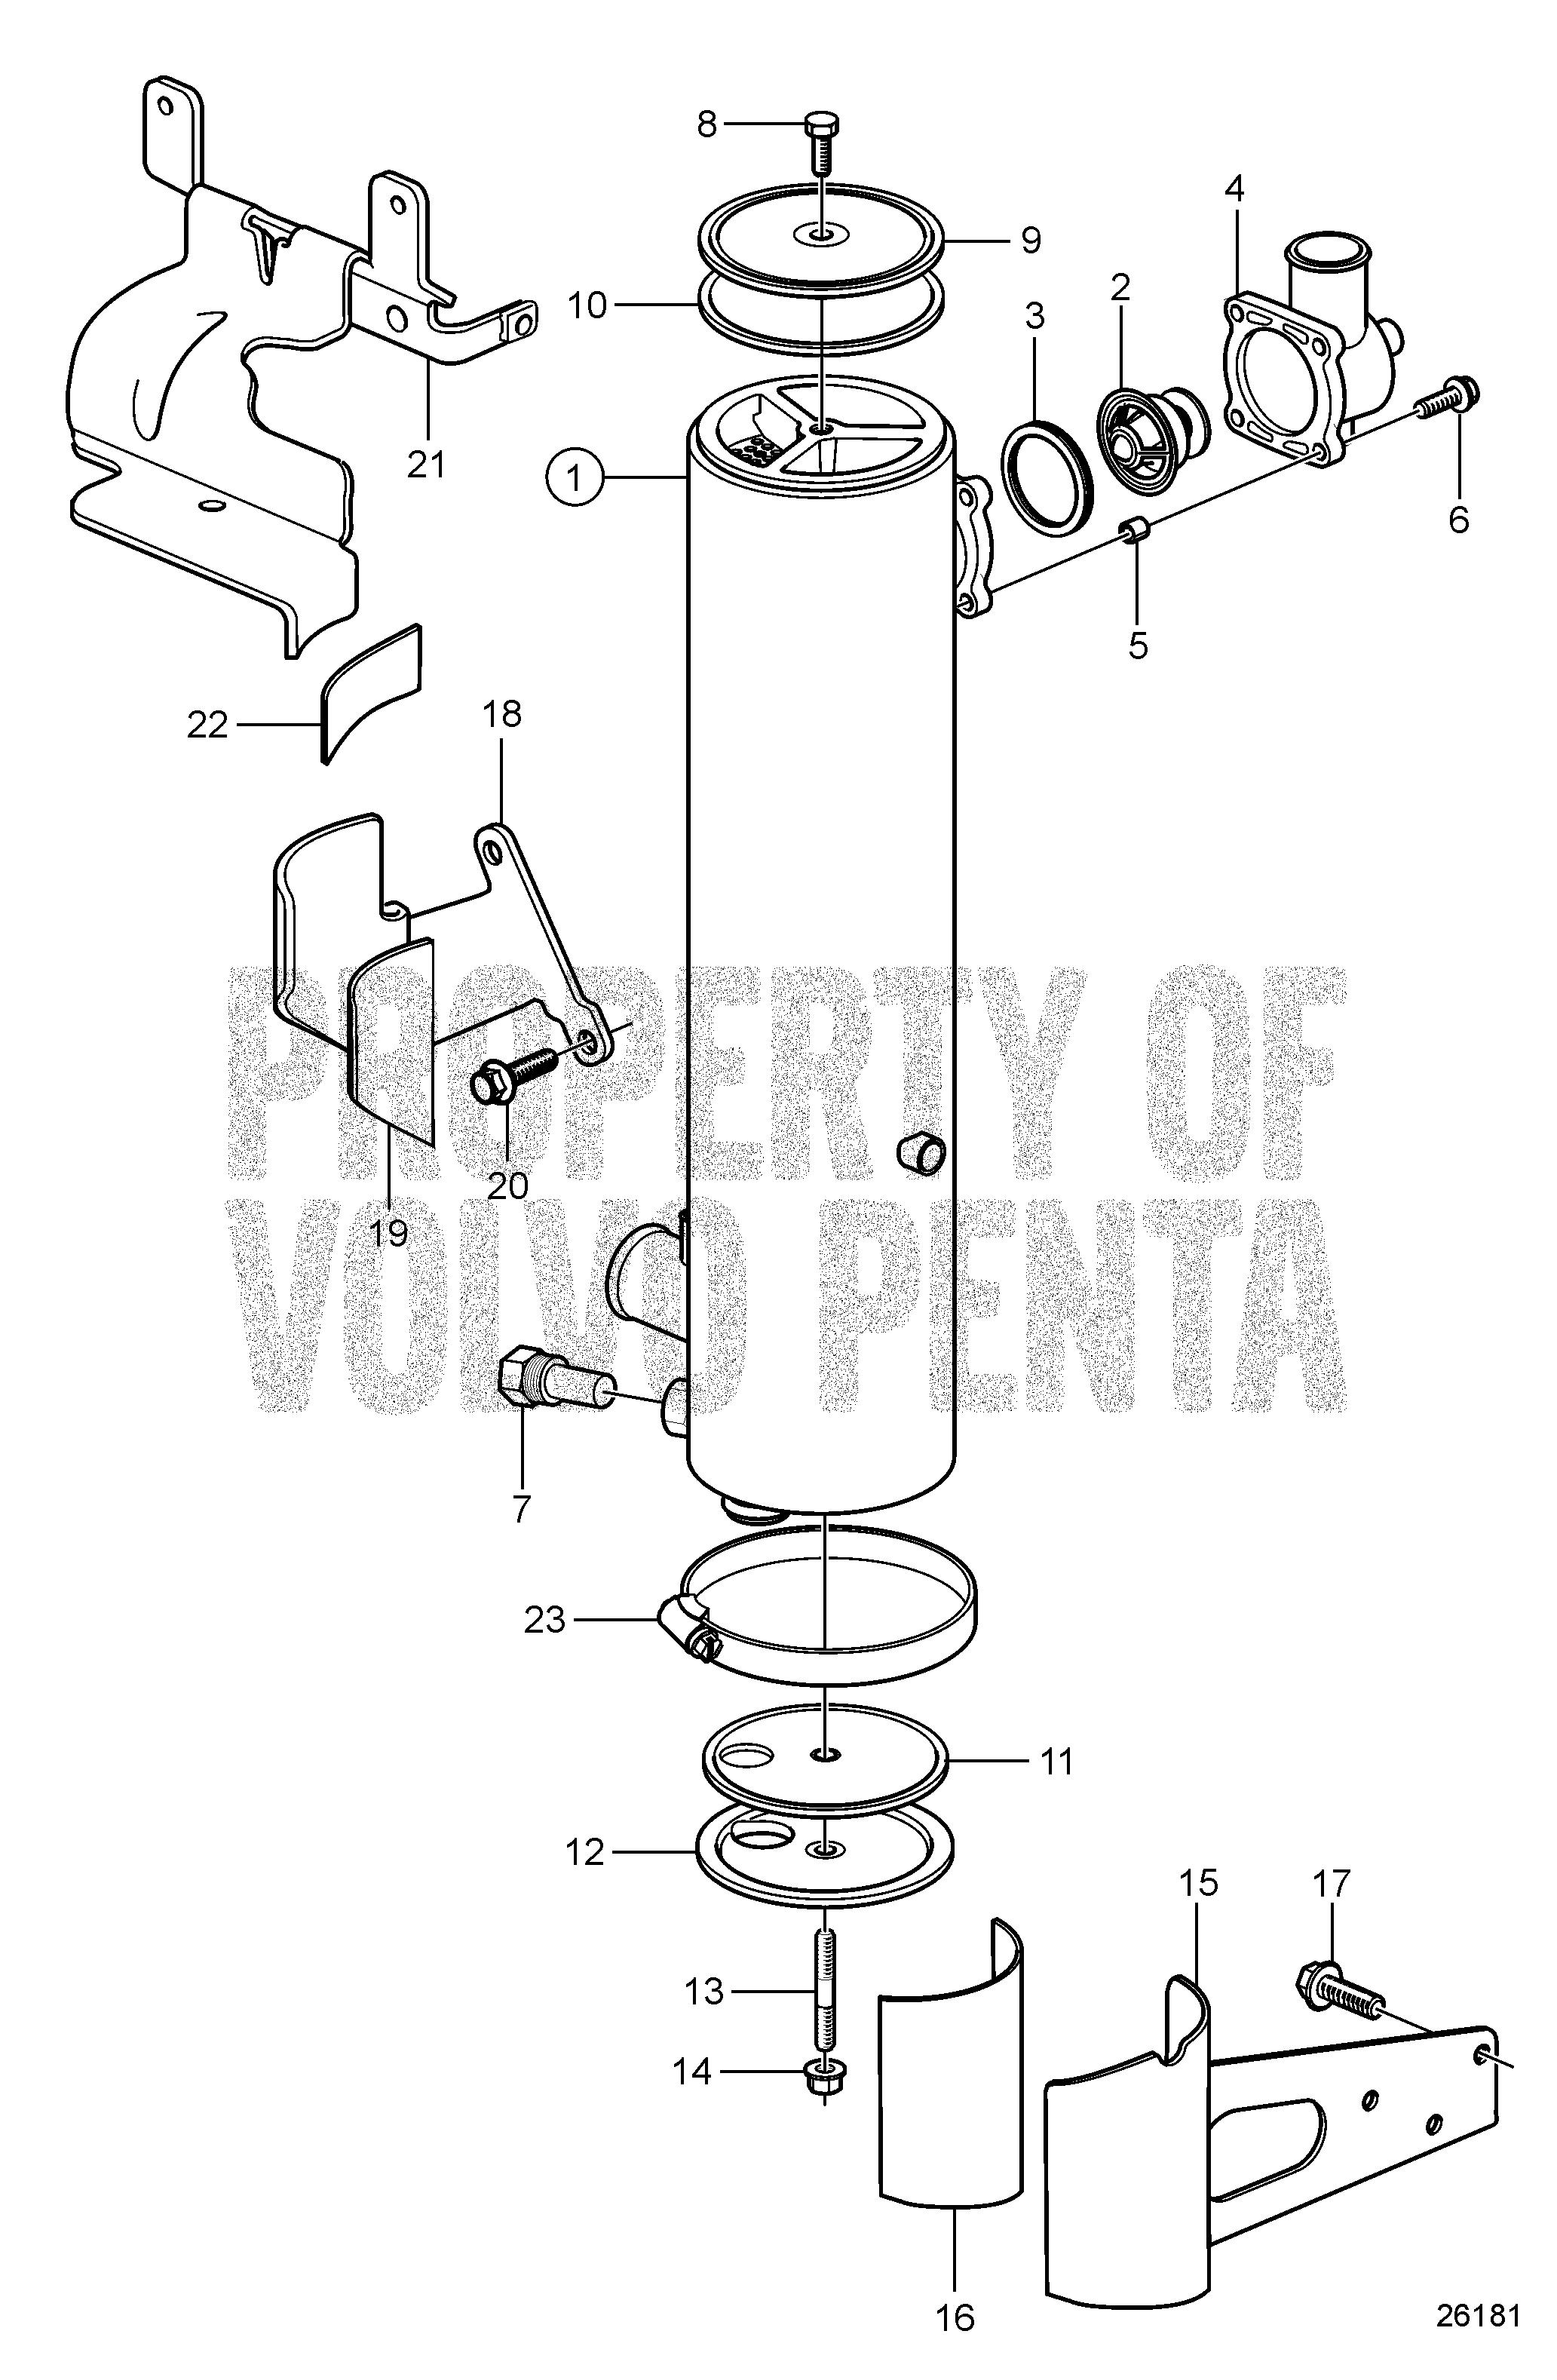 Volvo Marine Gasoline Engines V8 380 C A B Heat Draw Diagram Of Engine Ref Description Qty Required Price 1 Exchanger